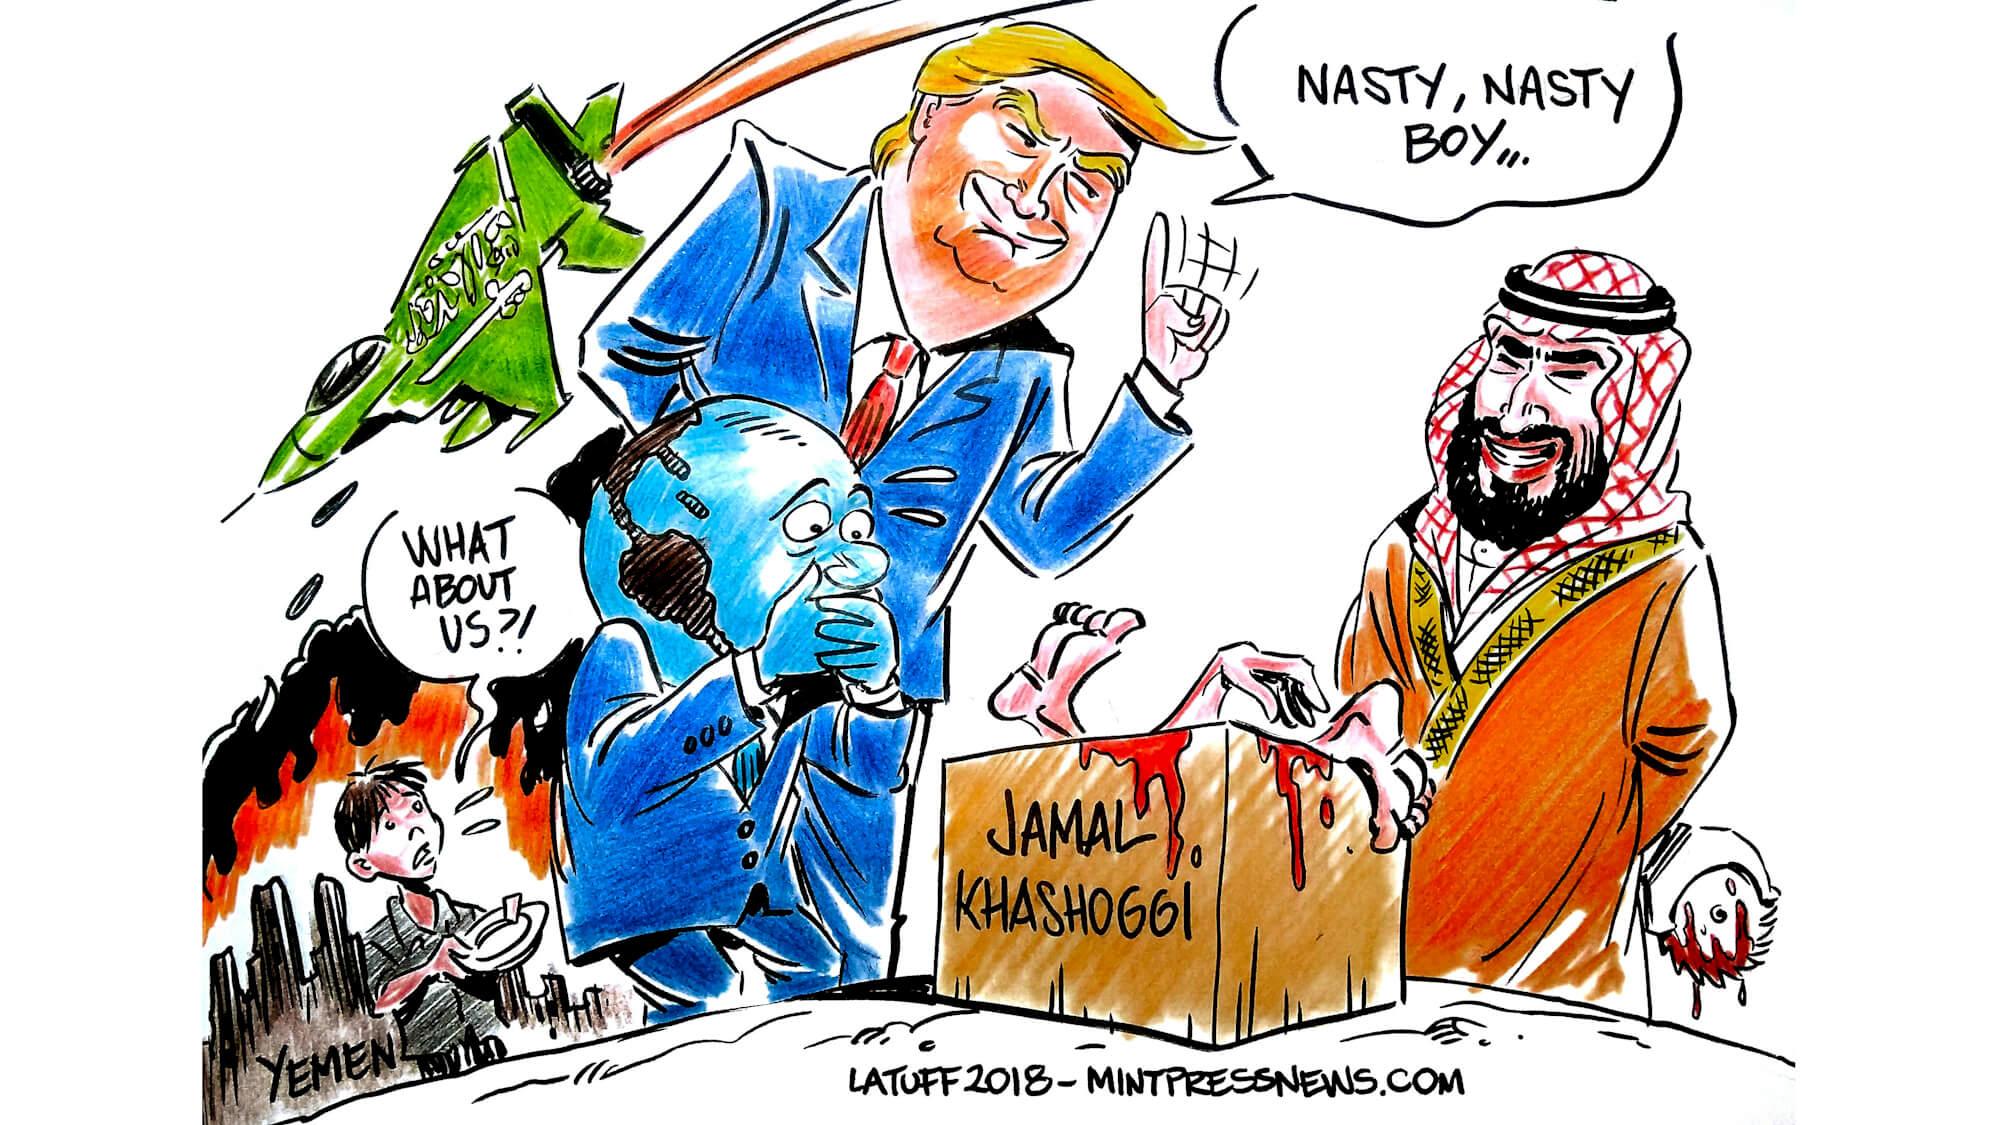 Trump Saudi Arabia Jamal Khashoggi Cartoon